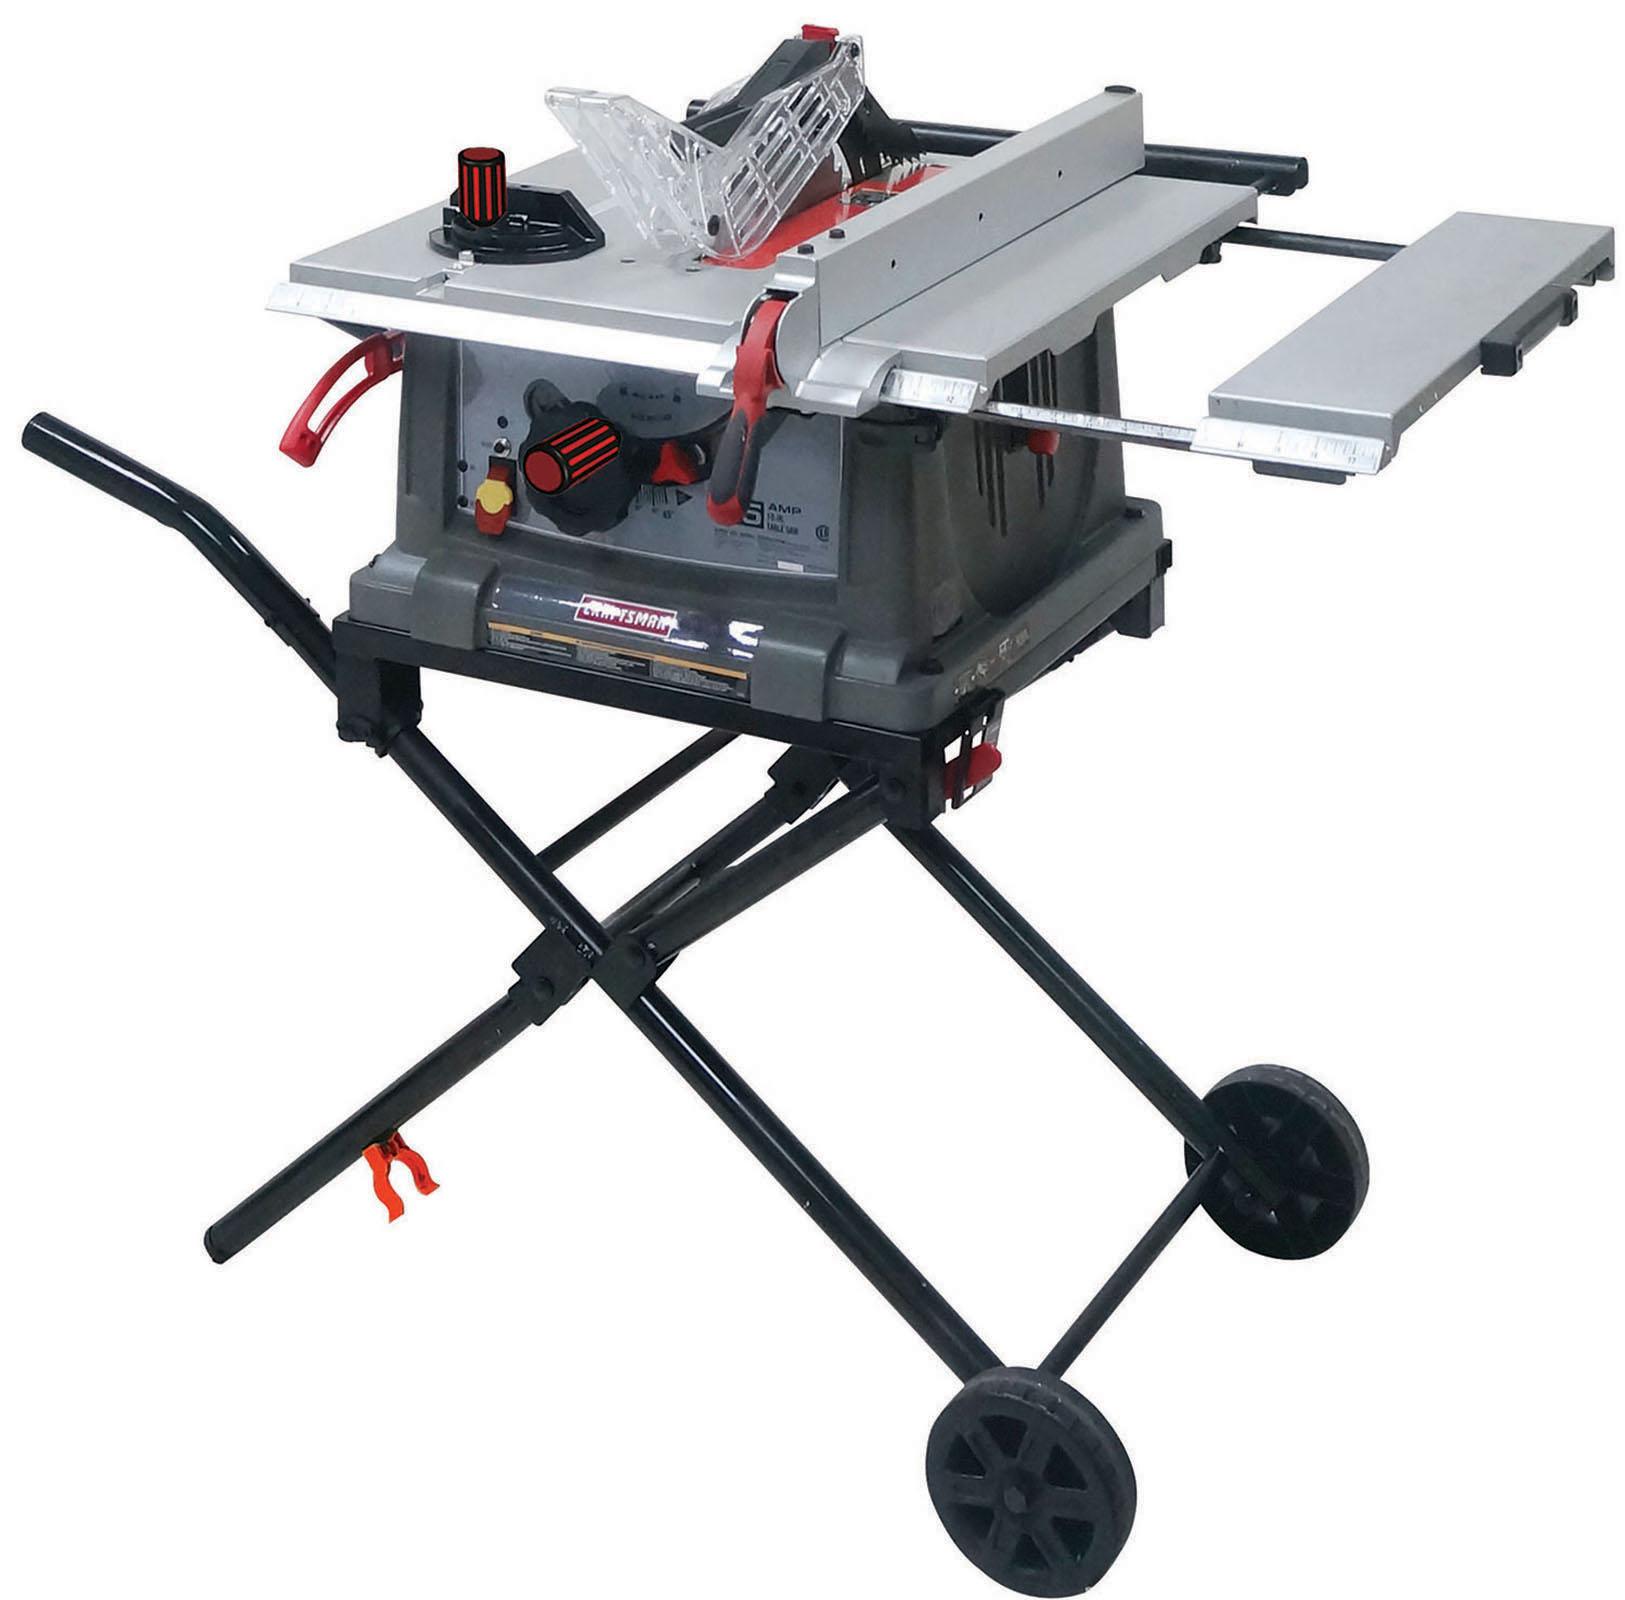 medium resolution of craftsman table saws craftsman table saw model 137 wiring diagram for craftsman table saw 137 248830